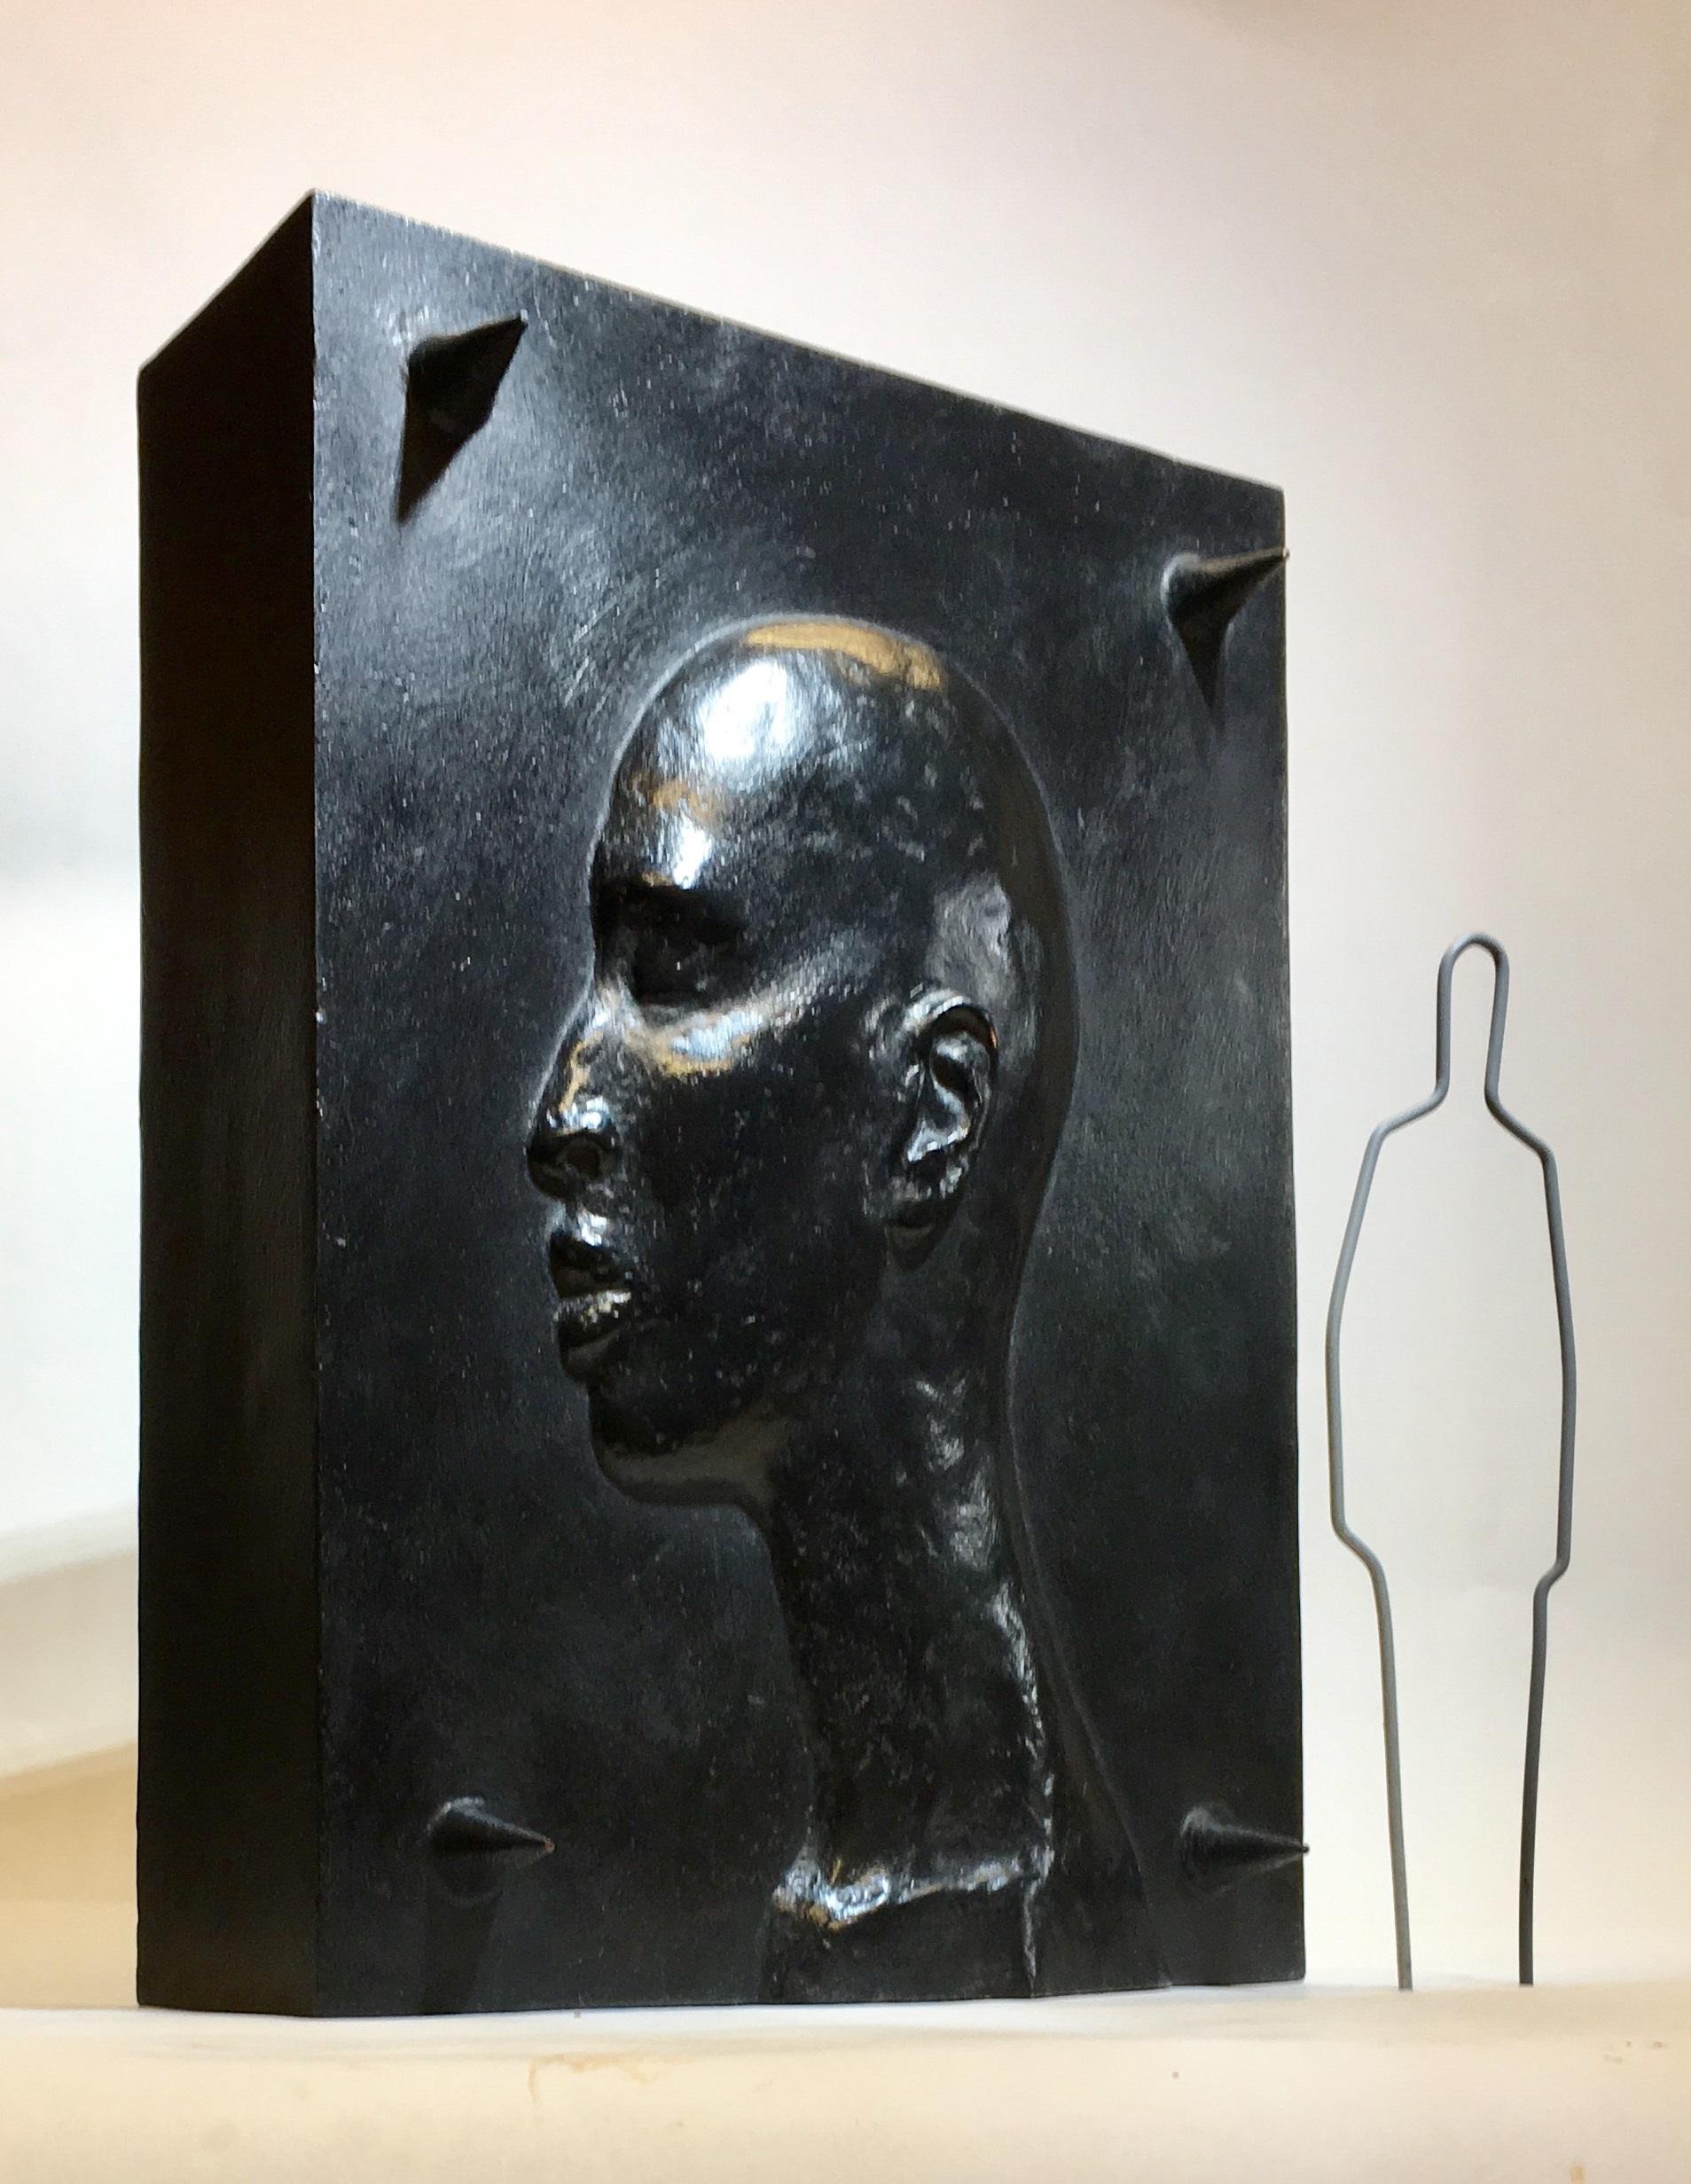 Black Lives Matter sculpture proposal by Vincent Gray